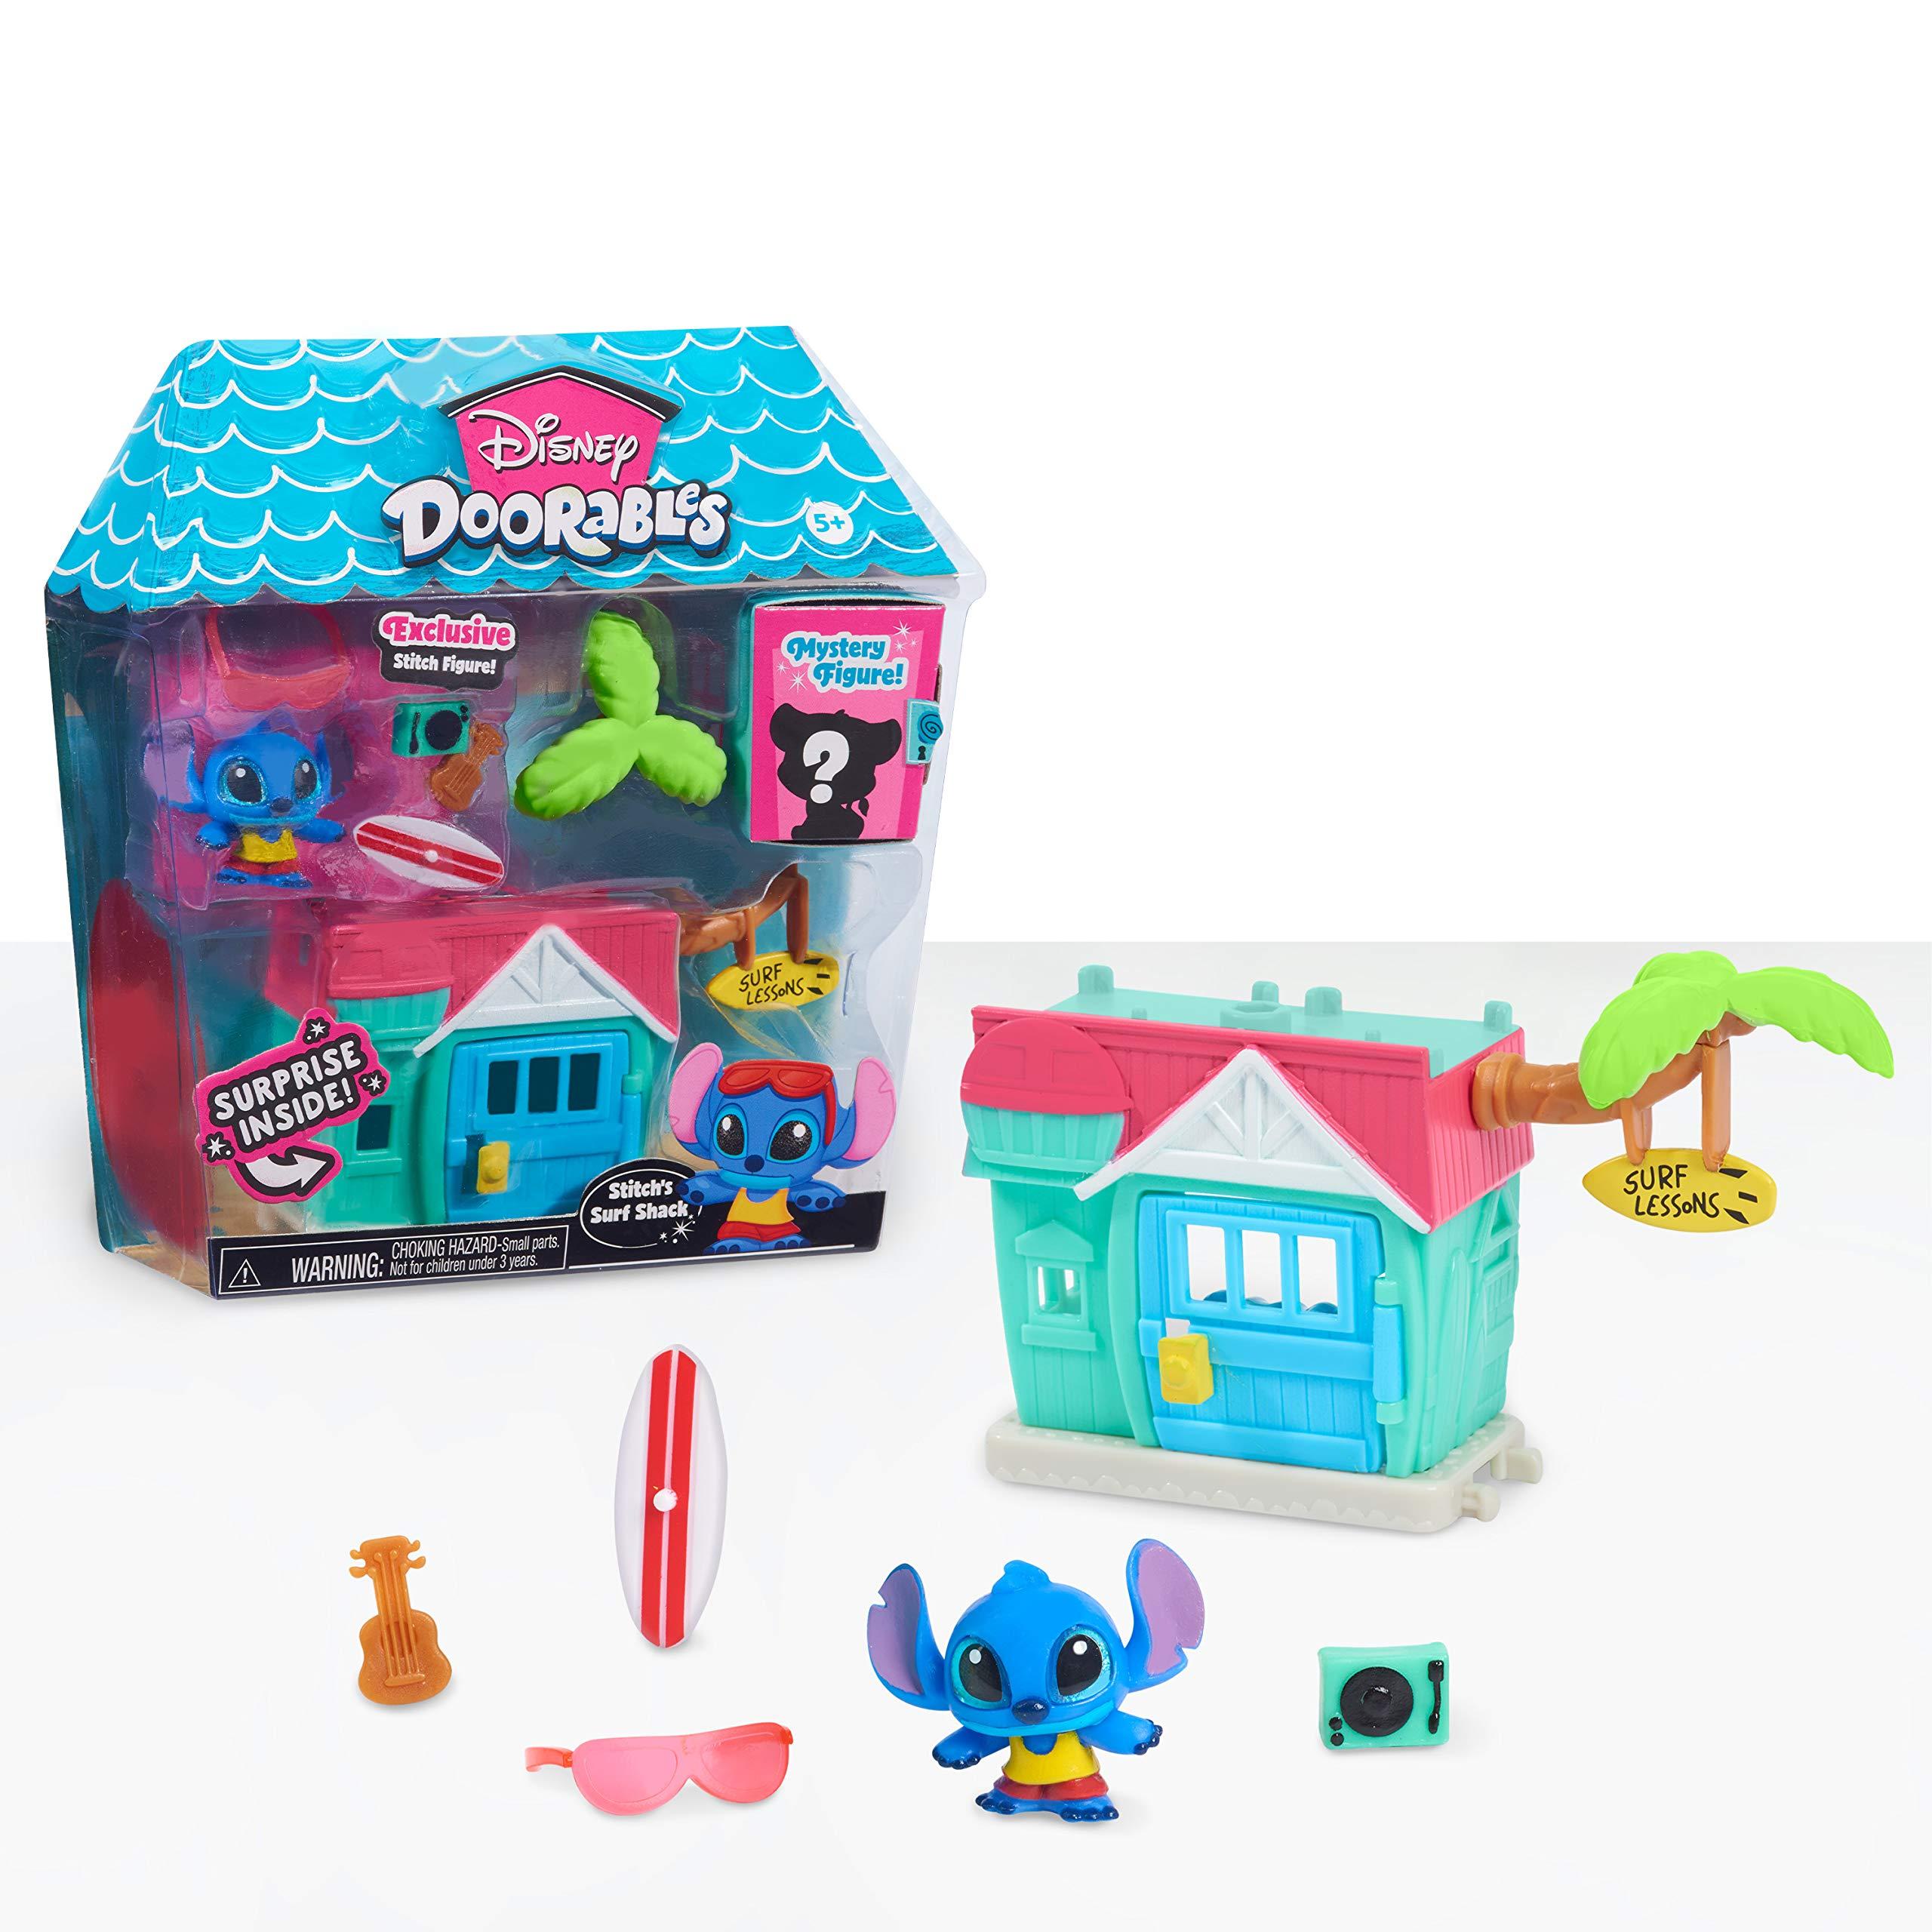 Disney Doorables Mini Playset Stitch's Surf Shack, Multi-Color